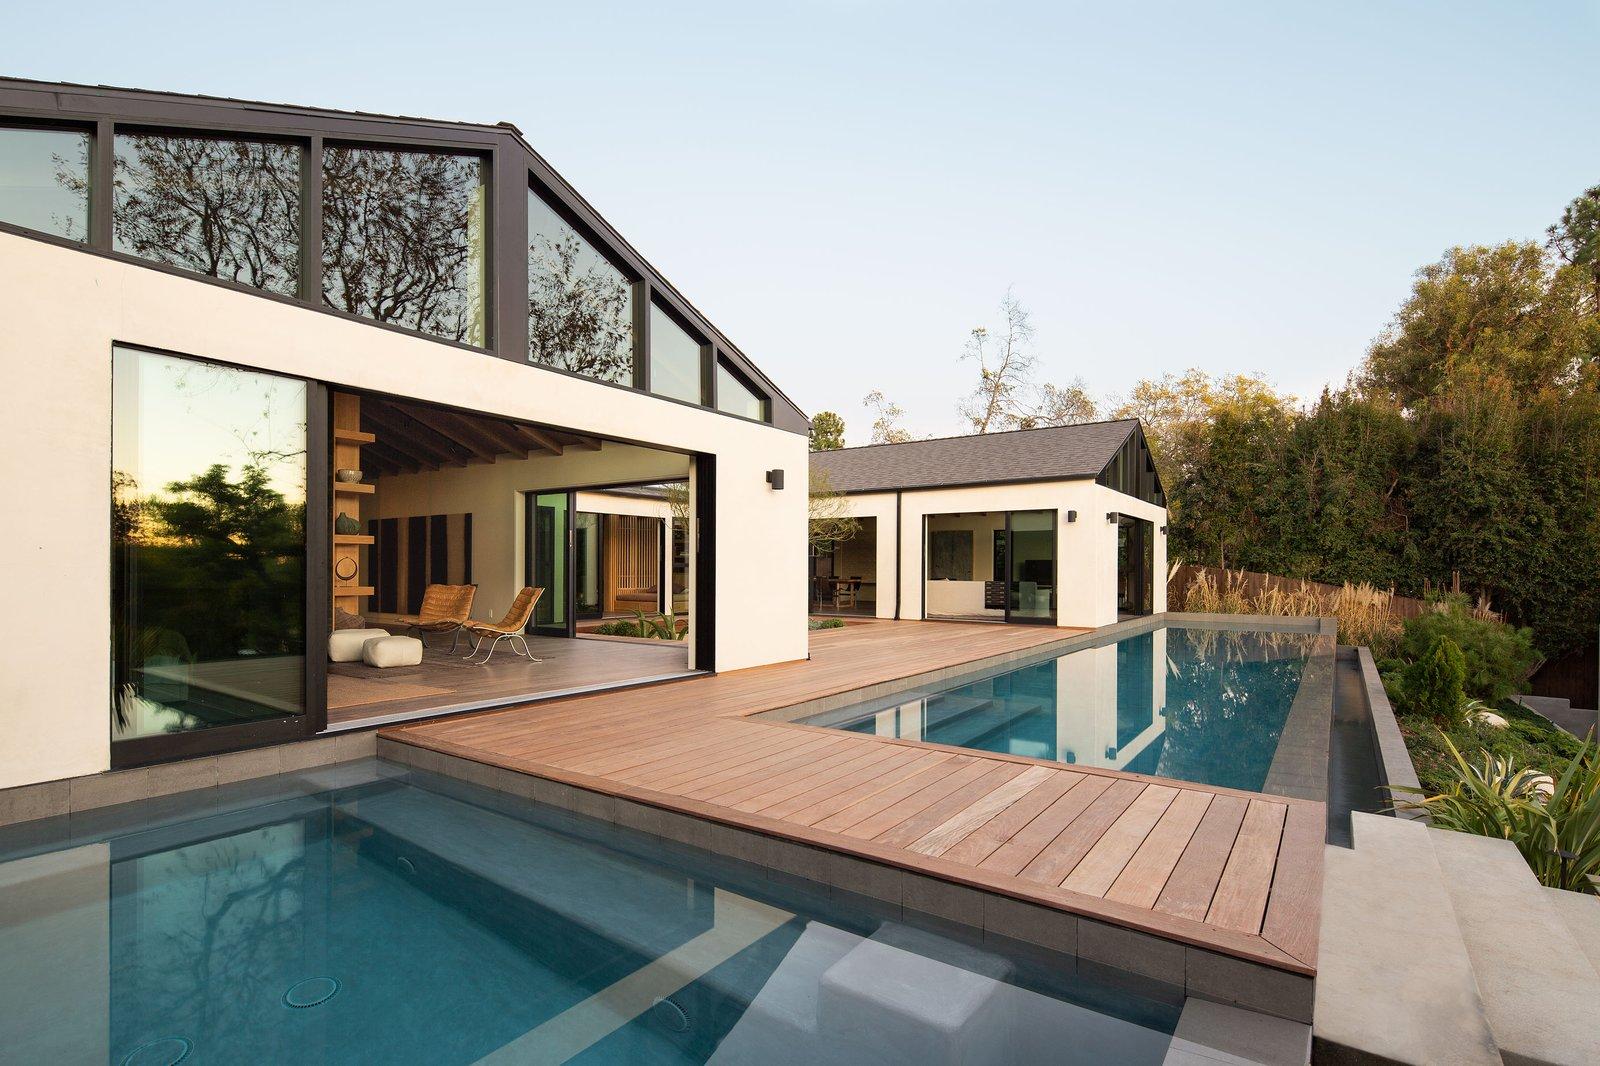 Woodrow by Simo Design